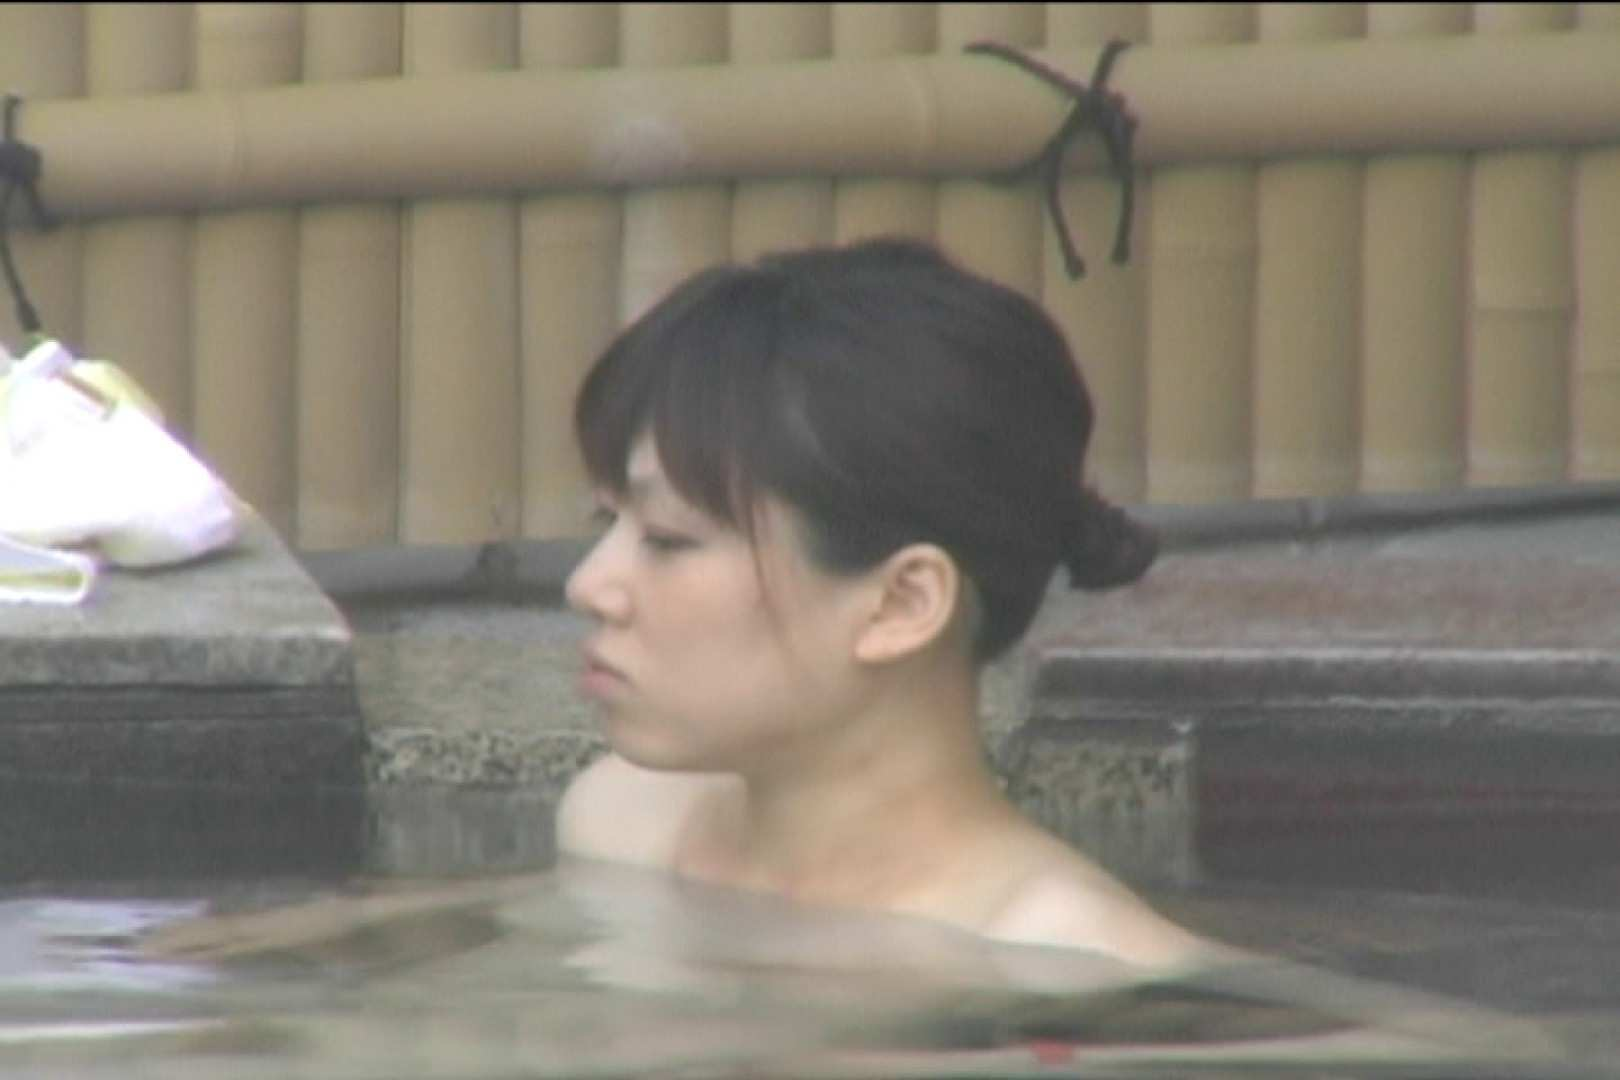 Aquaな露天風呂Vol.121 美しいOLの裸体   露天風呂突入  105pic 43